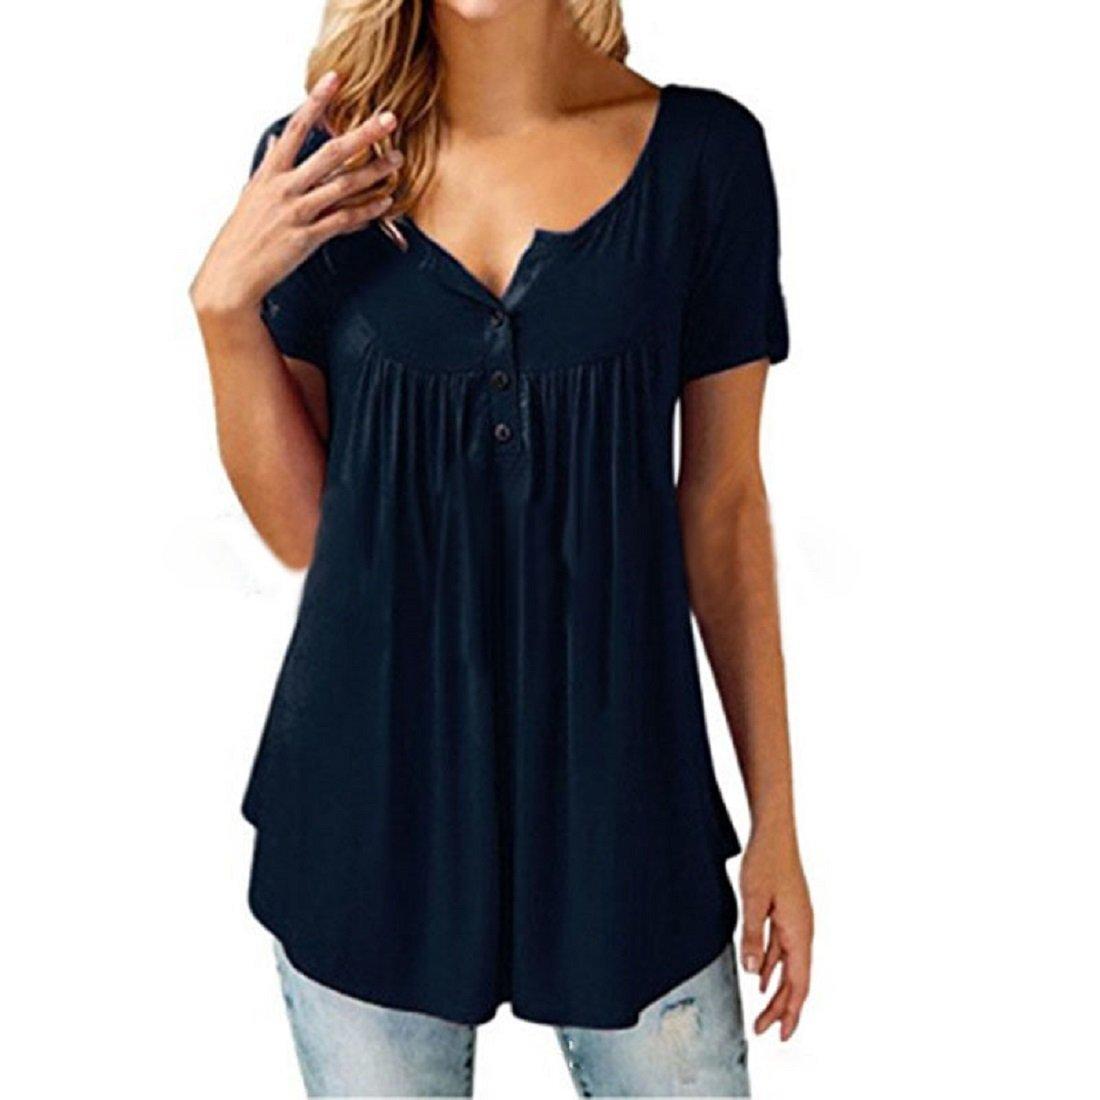 Yoofashion Womens Casual T Shirt Solid Summer Sleevel Plain Short Cotton Dress Black